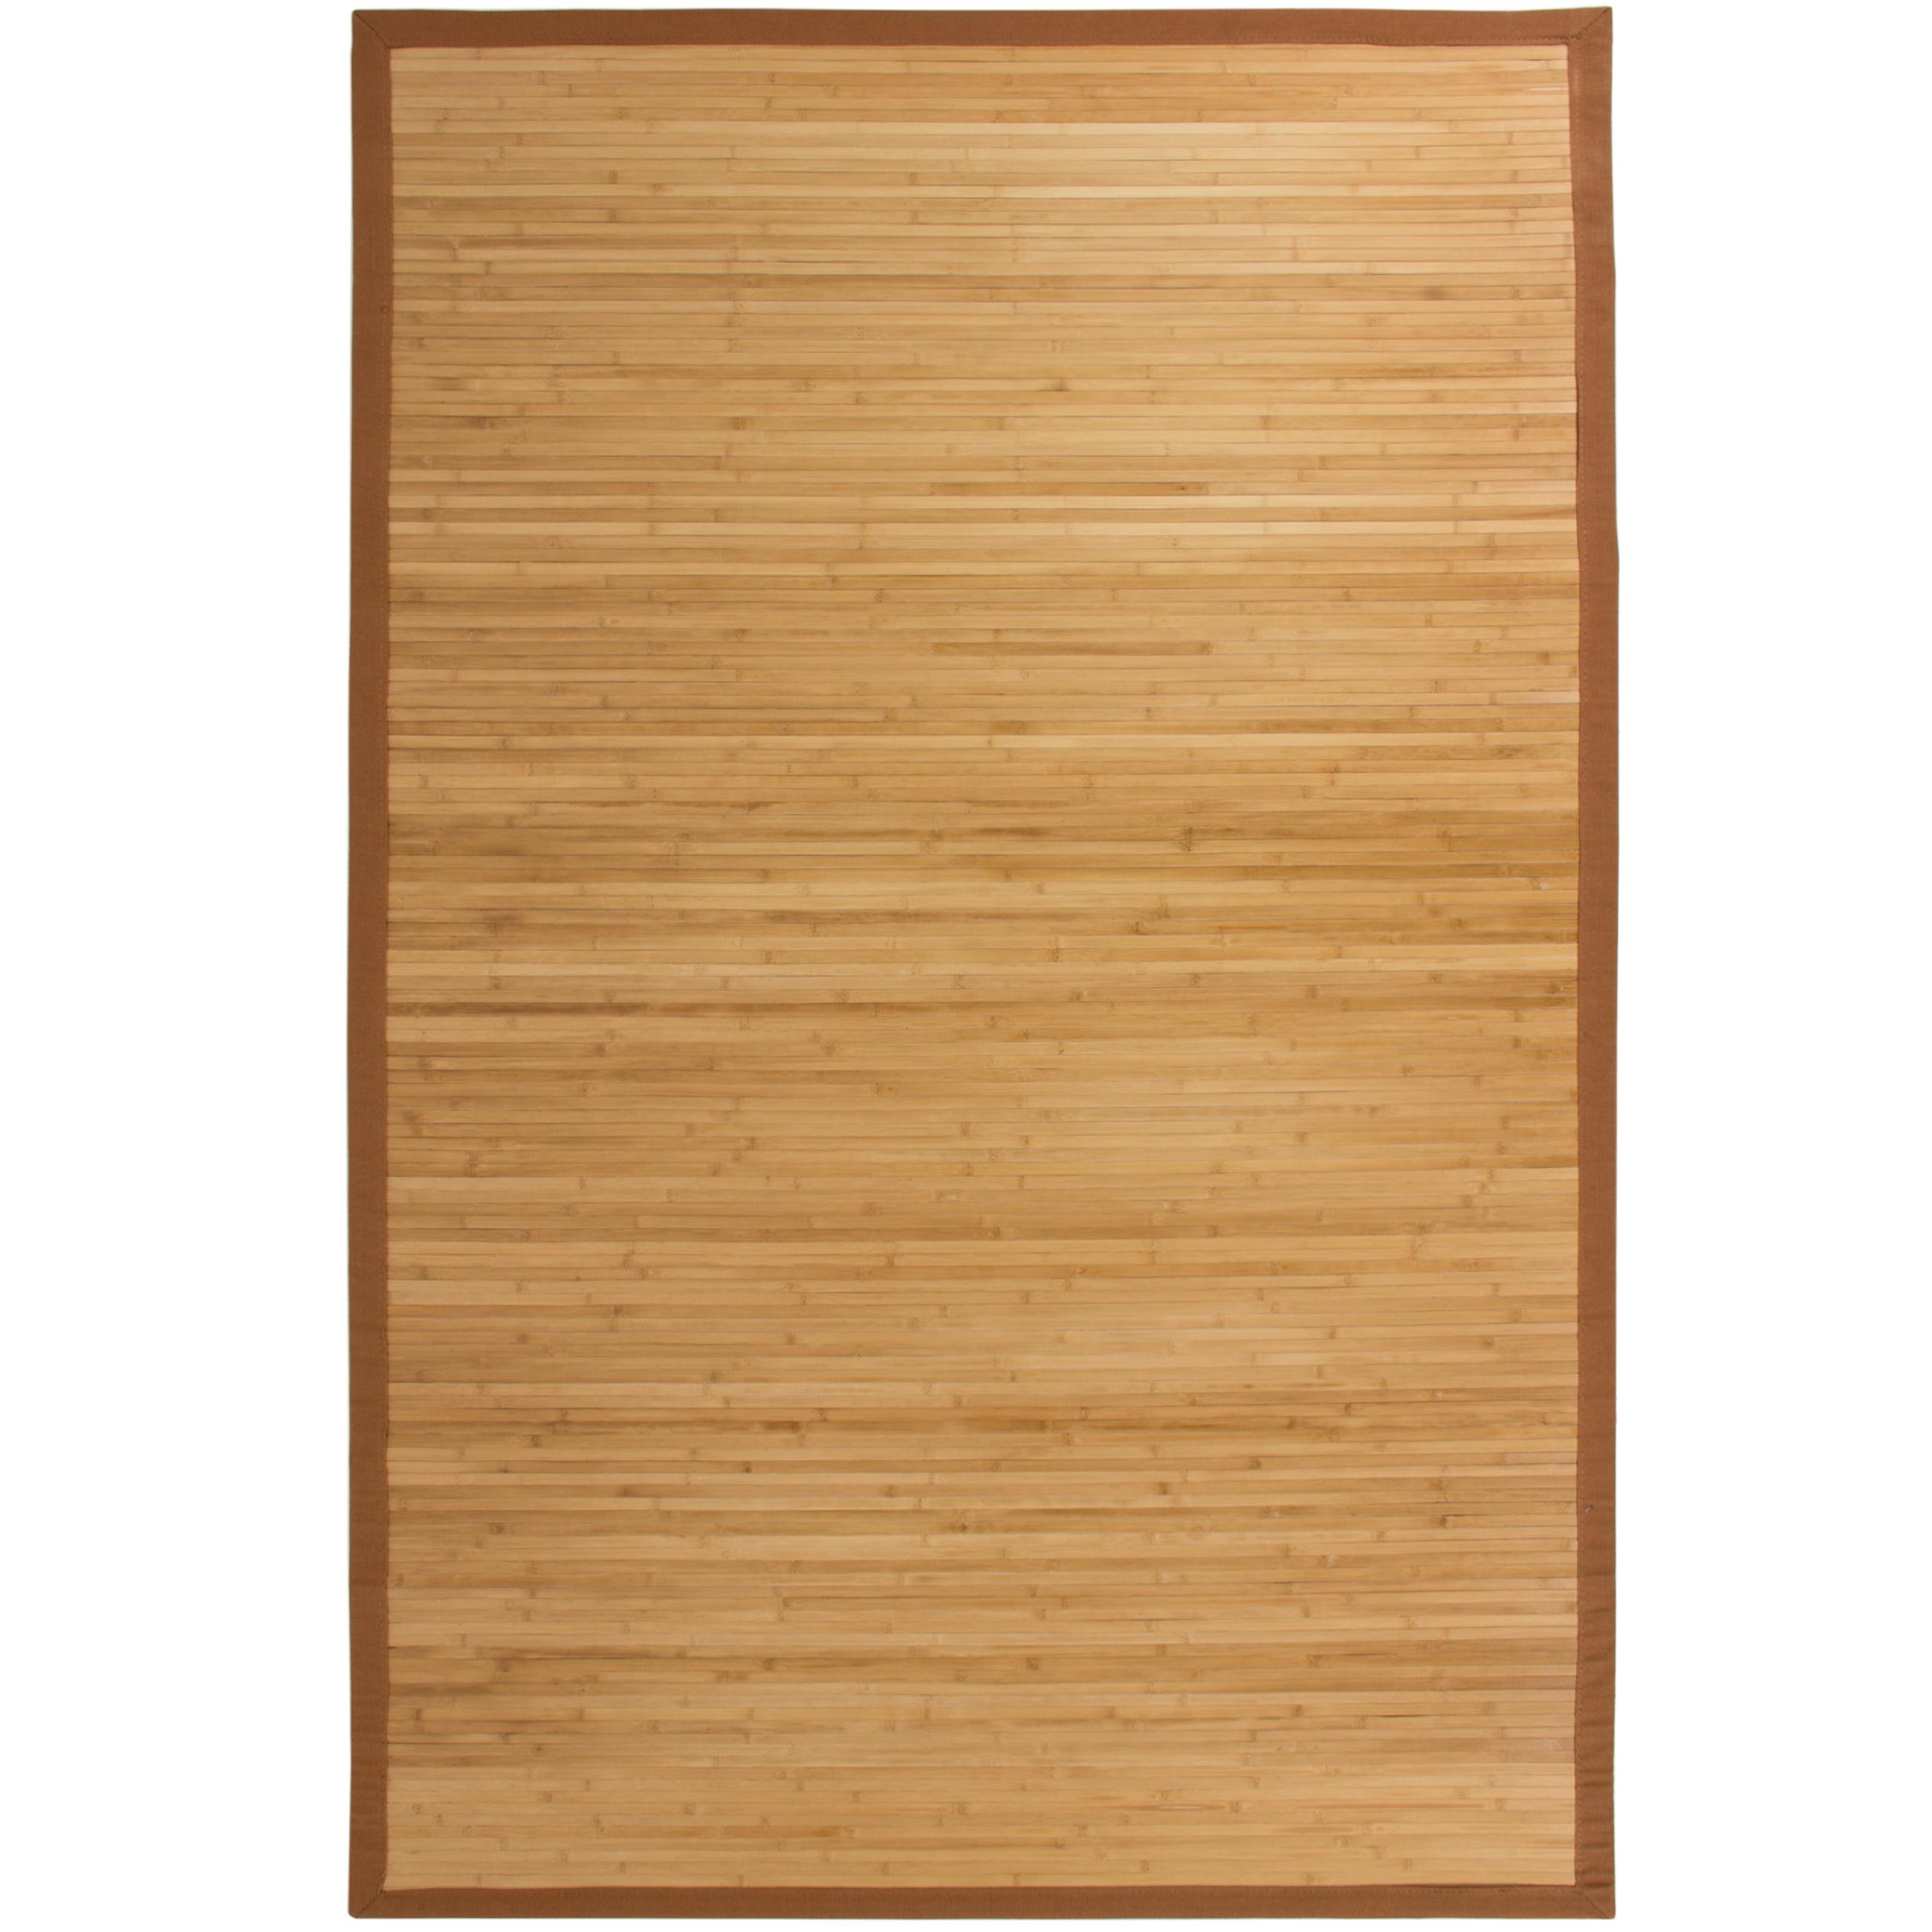 Bamboo Area Rug Carpet Indoor 5' X 8' 100% Natural Bamboo Wood New -  Walmart.com